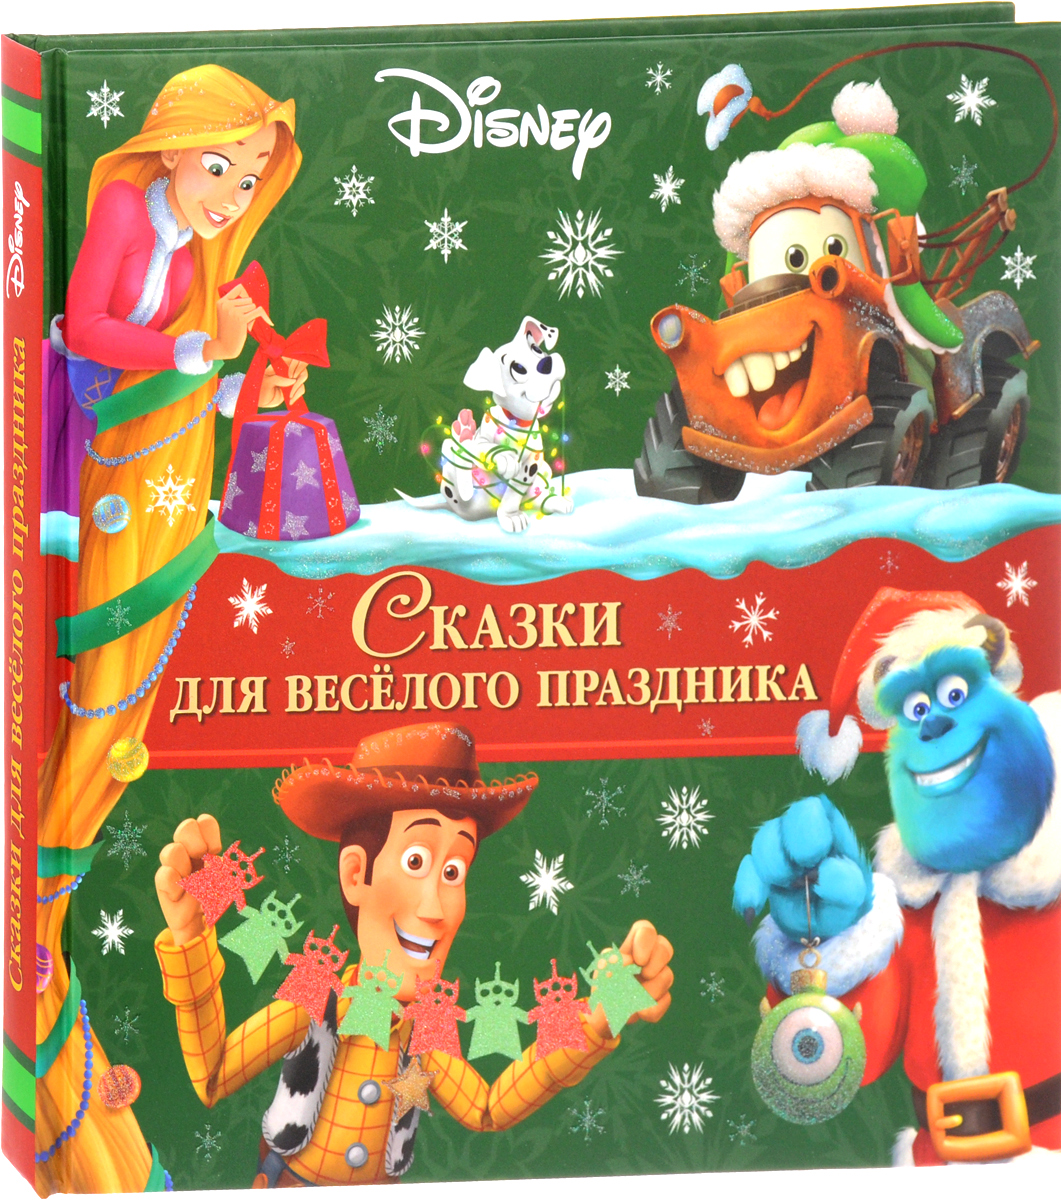 Сказки для веселого праздника